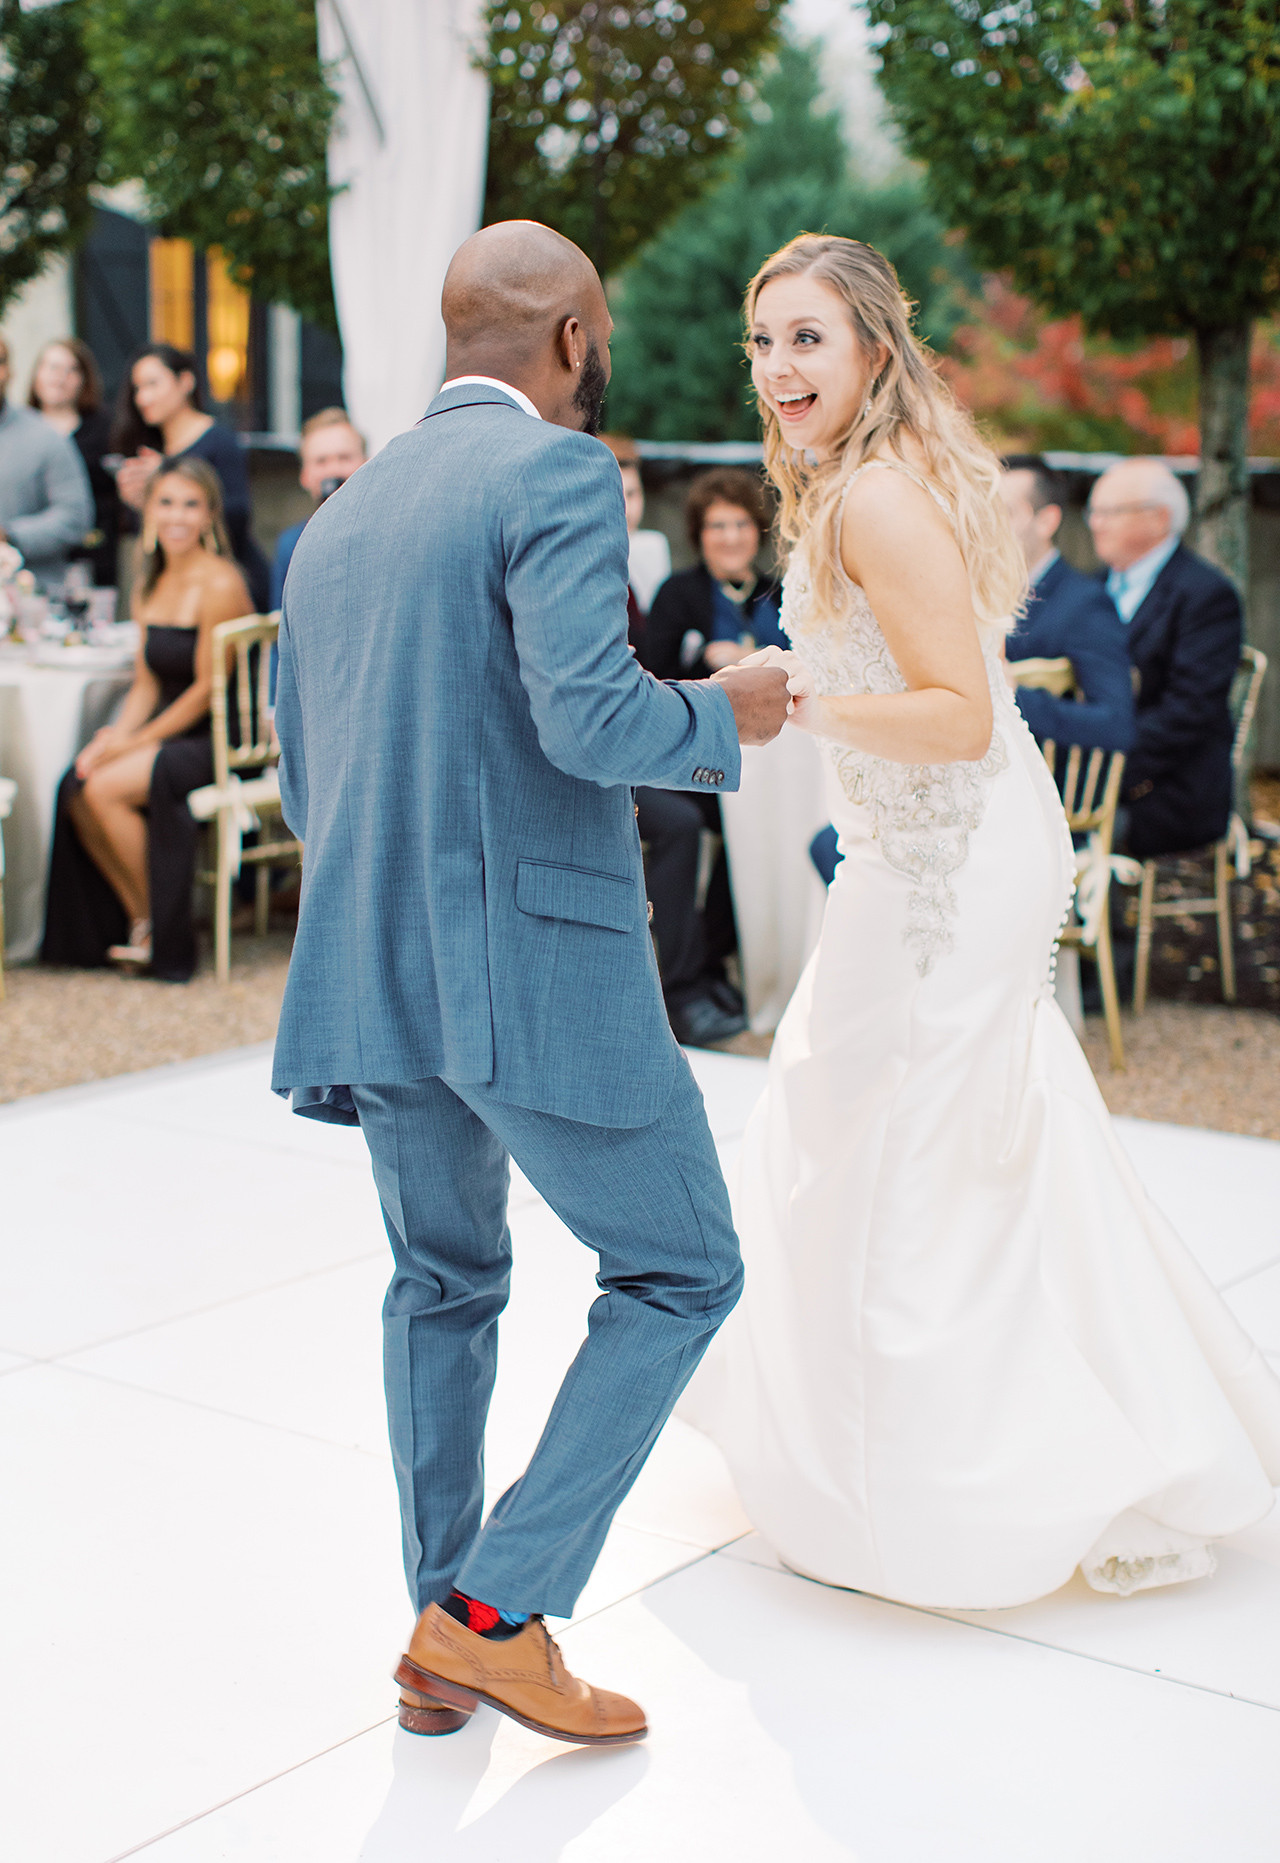 bride groom outdoor wedding reception first dance